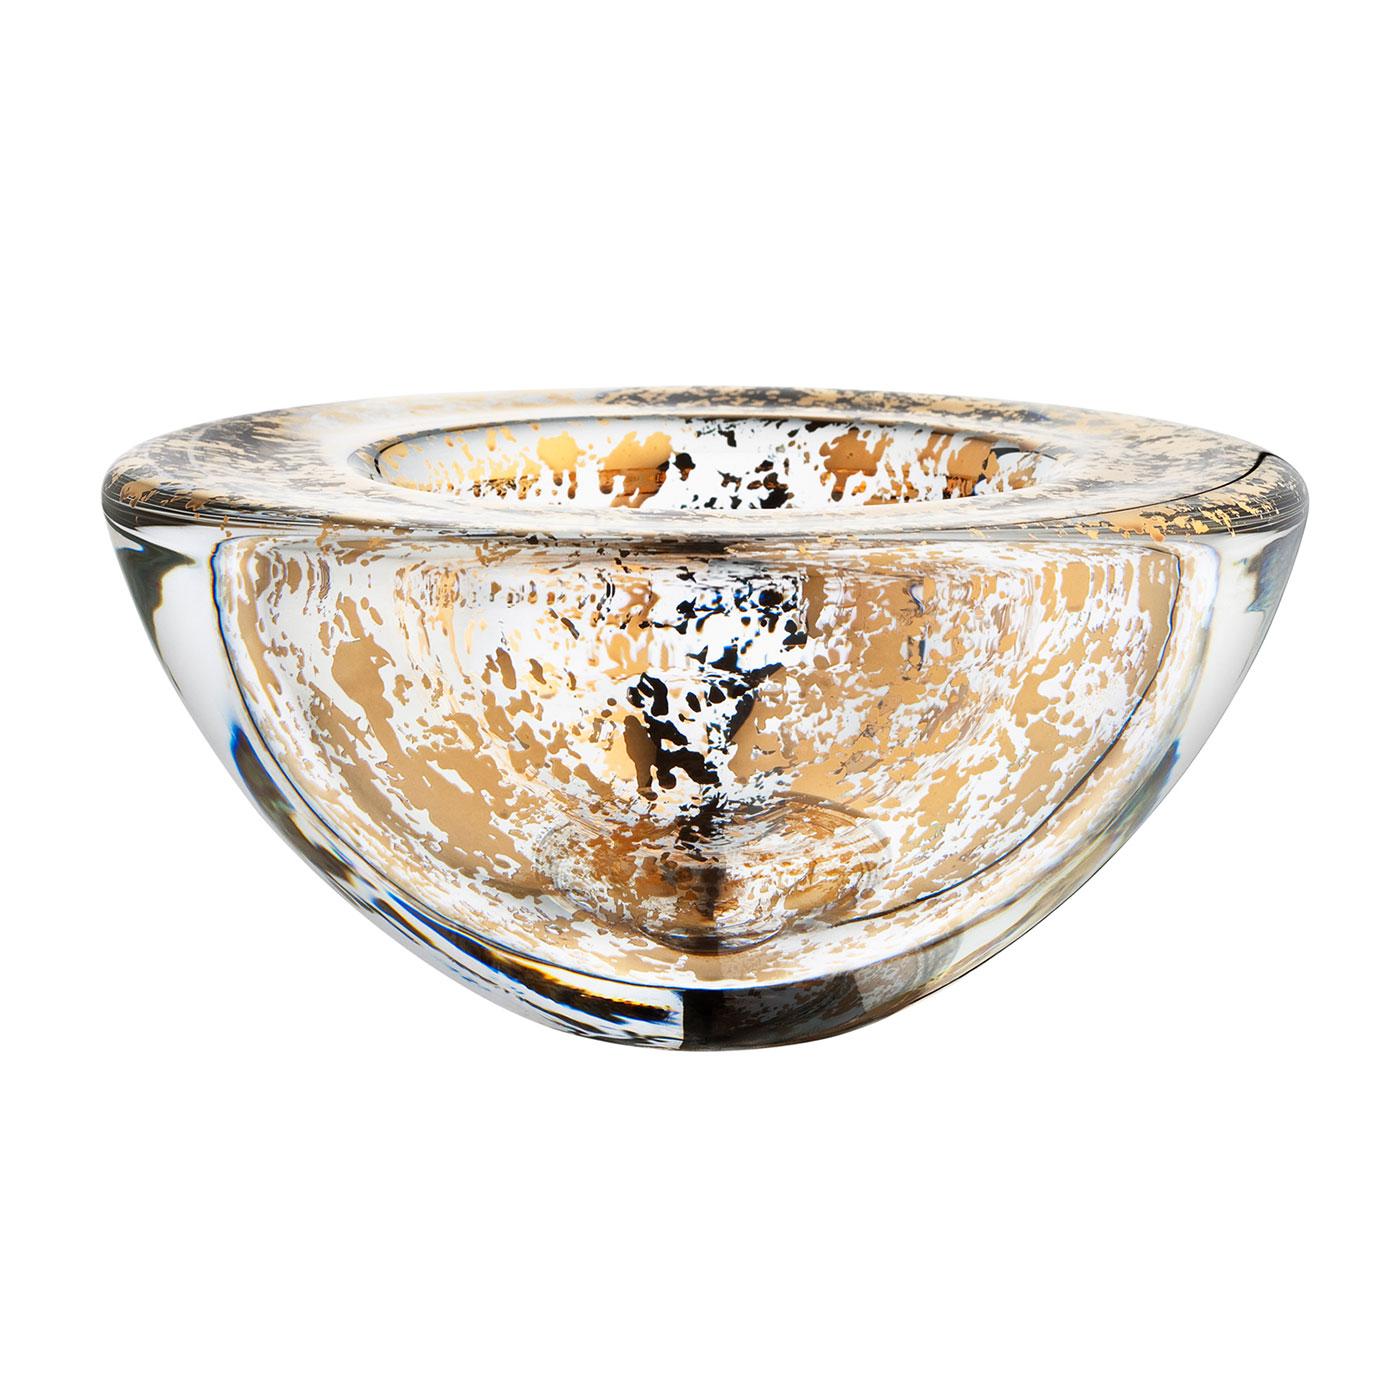 Obegi-Home-Accessories-Kosta-Boda-Glimmer-Bowl-Gold